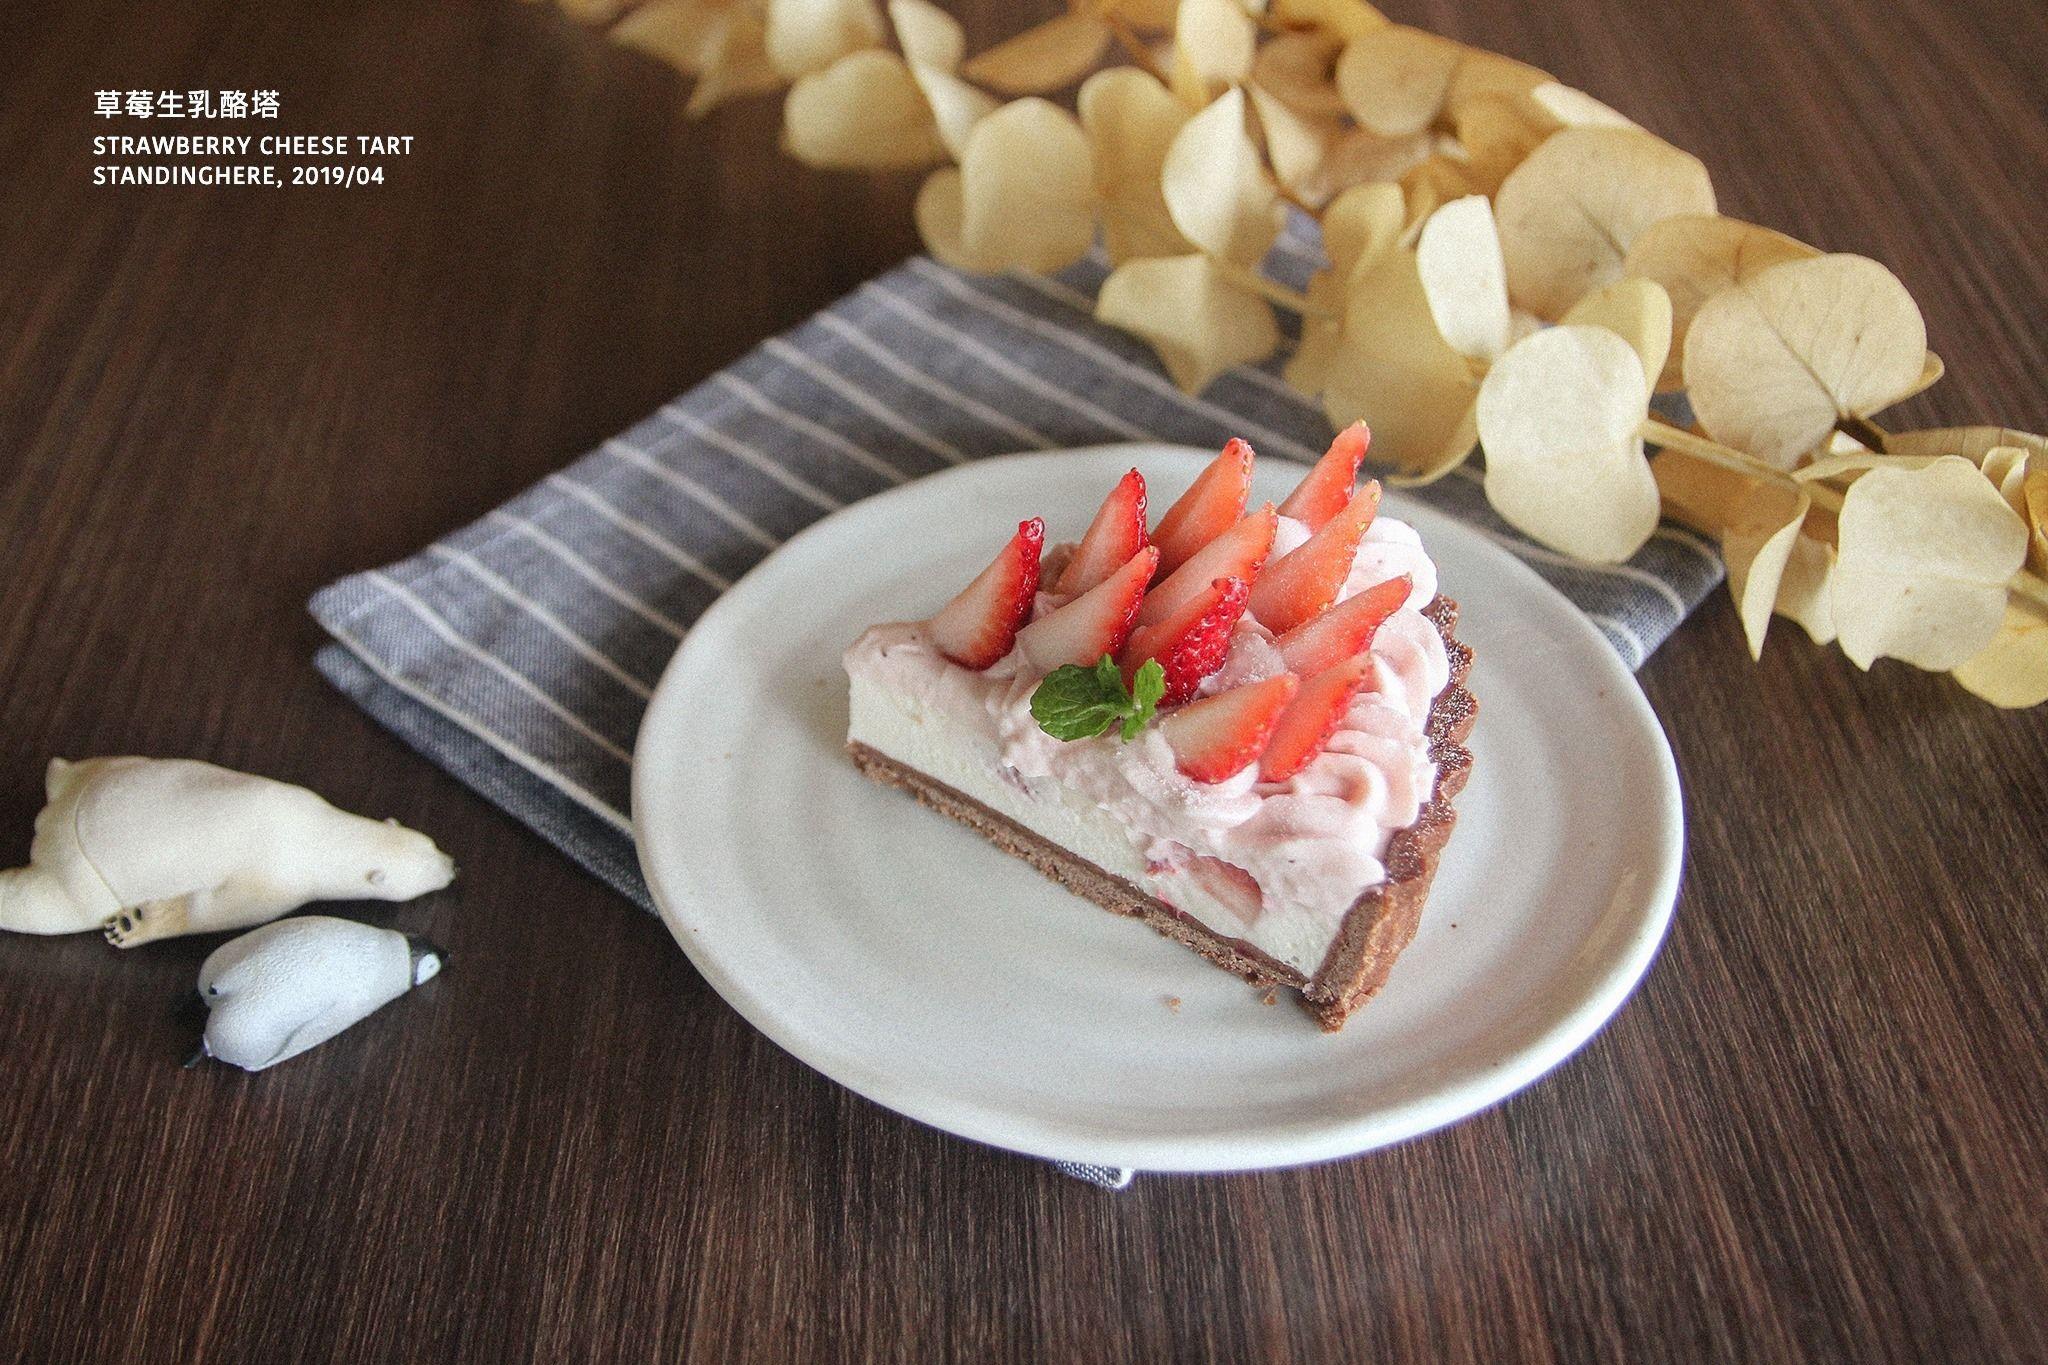 7-cake-草莓生乳酪塔.jpg